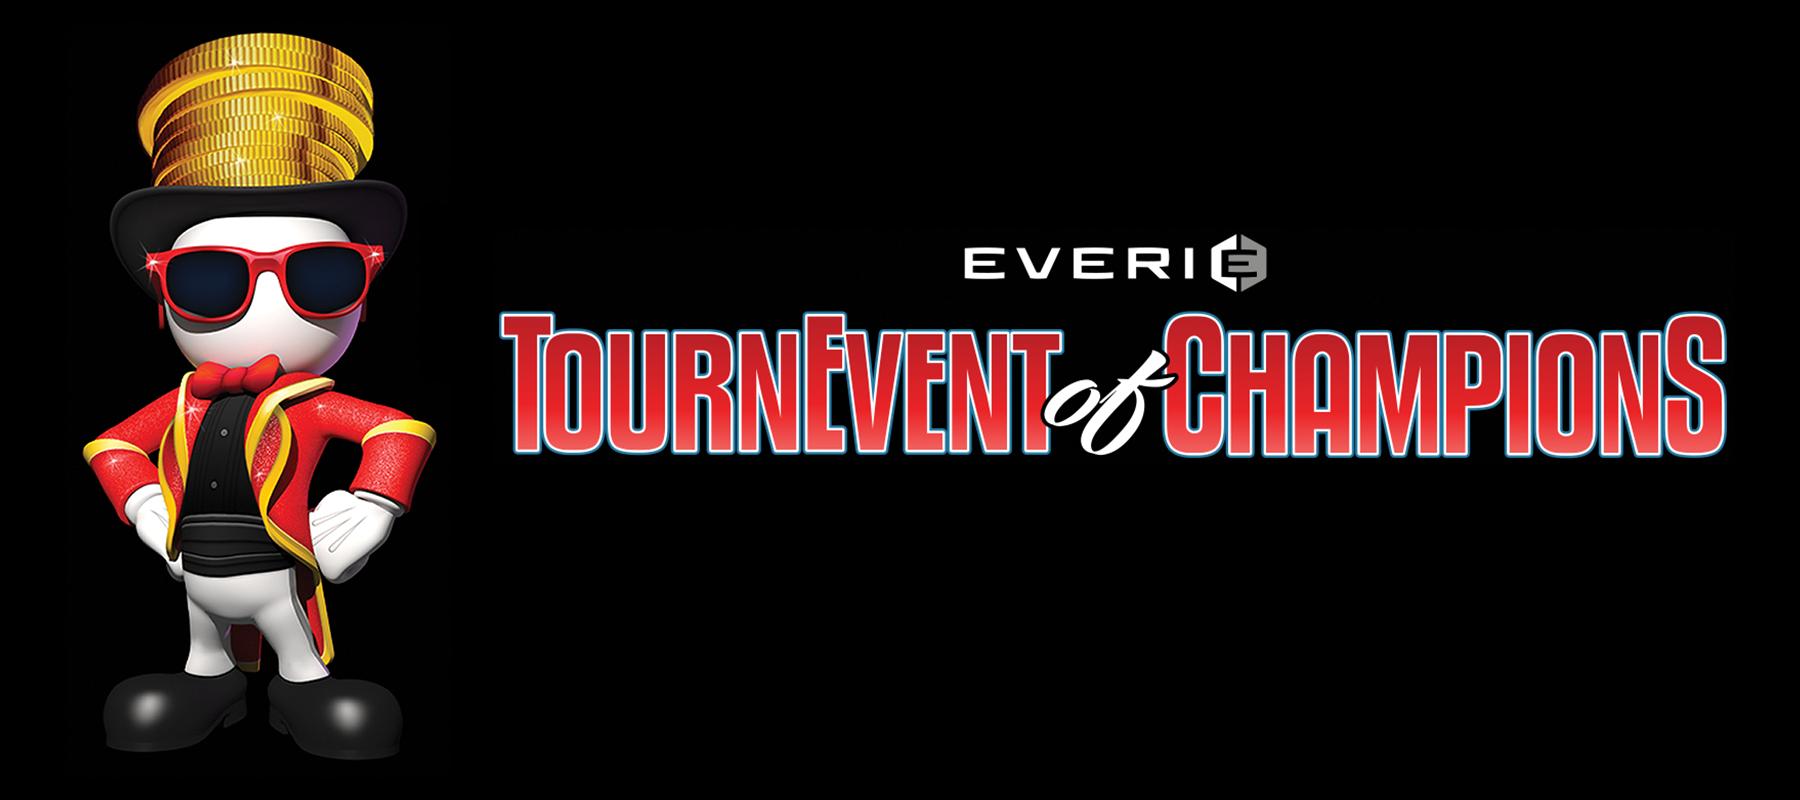 Everi Tournament